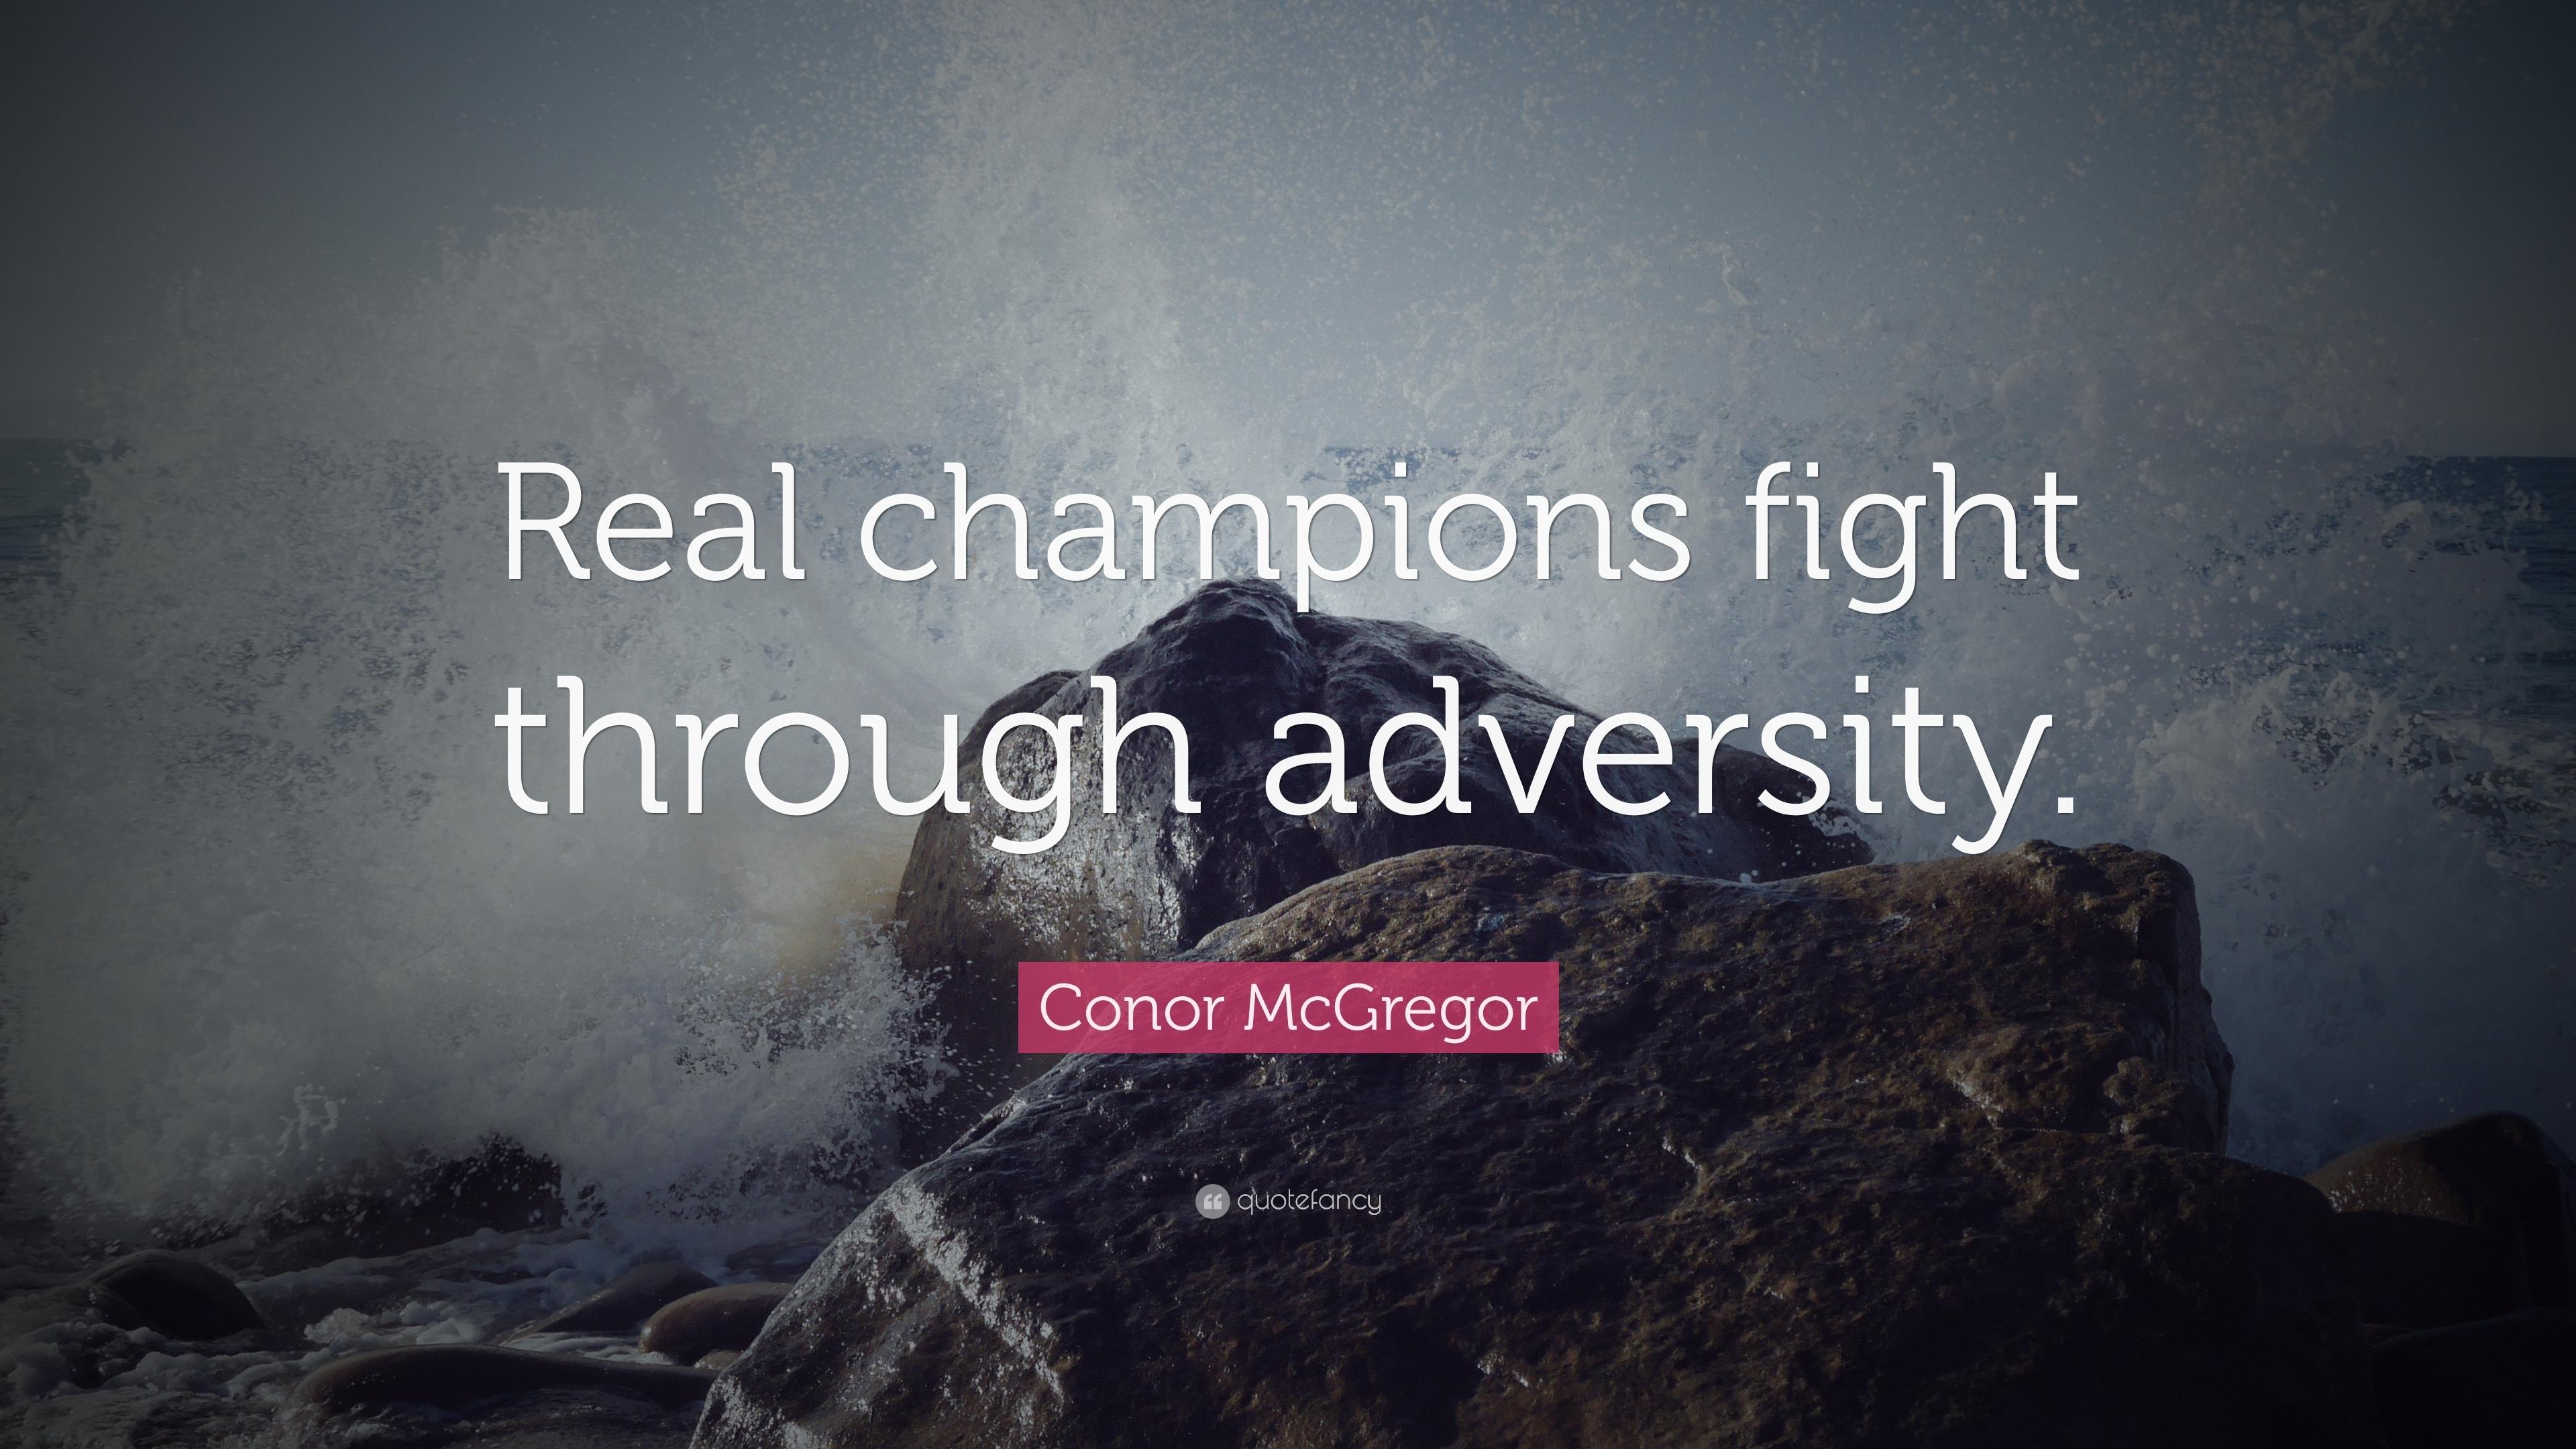 conor mcgregor quotes (64 wallpapers) - quotefancy